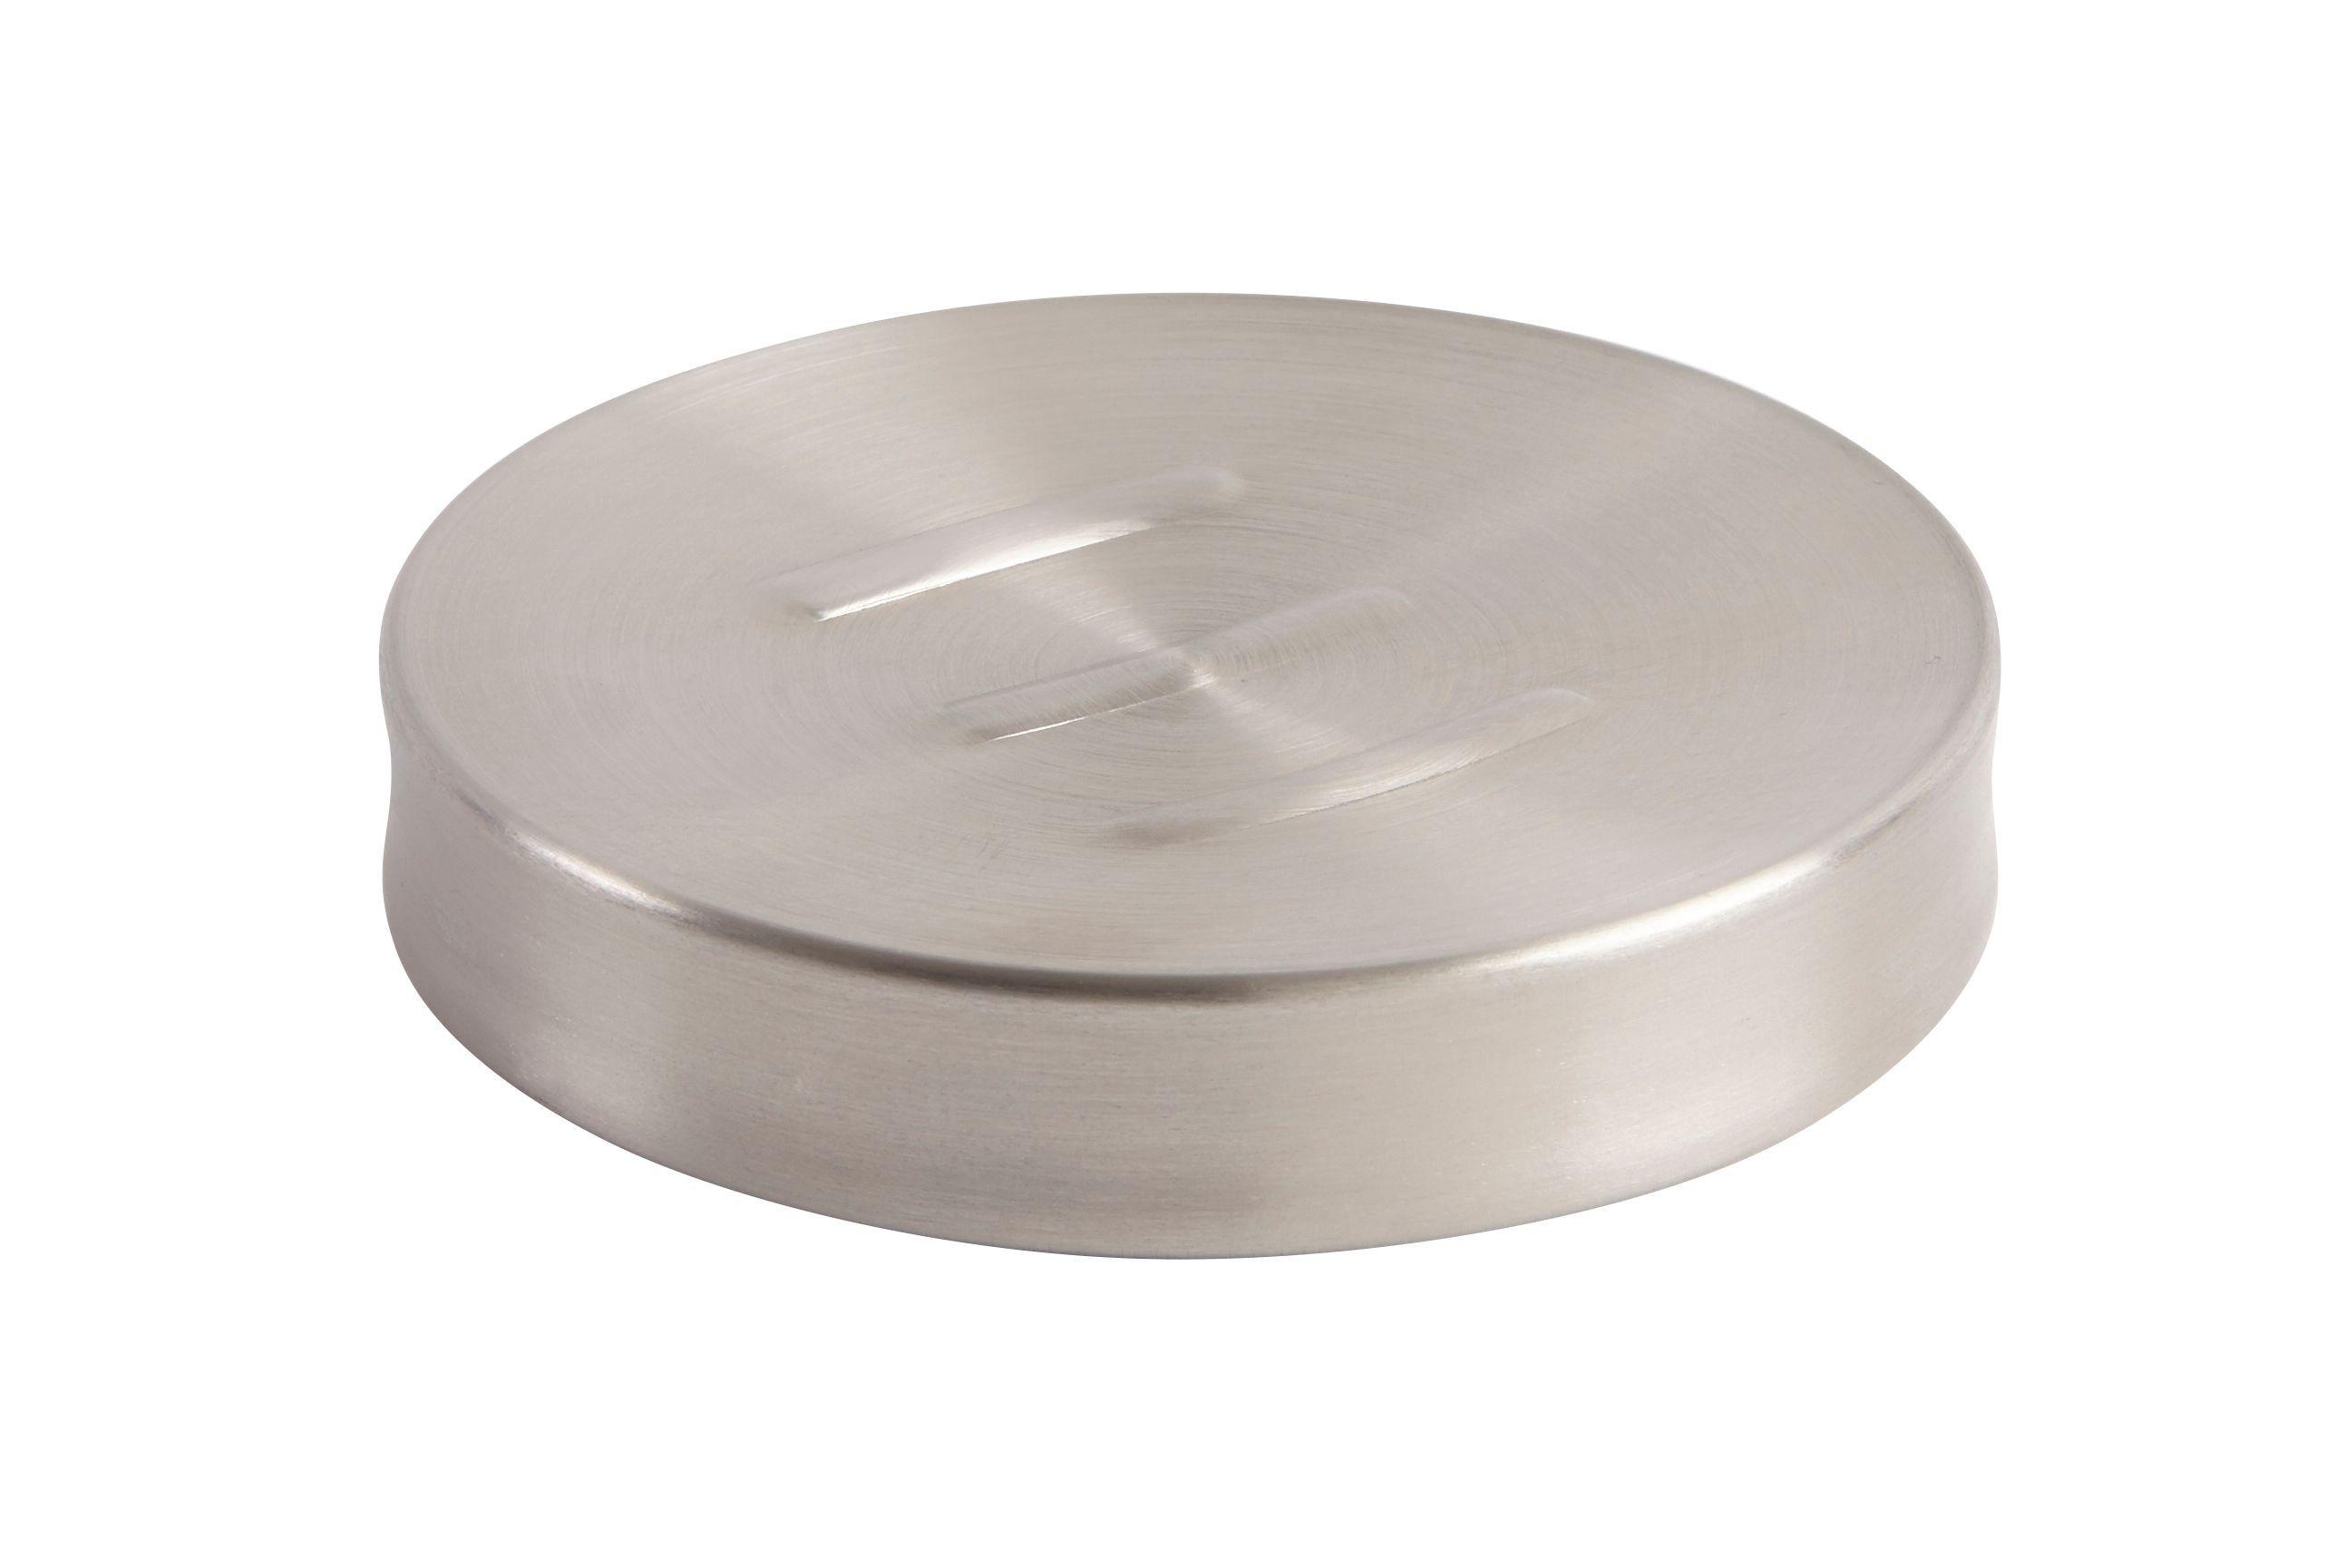 Cooke & Lewis Metal Brushed Effect Soap Dish